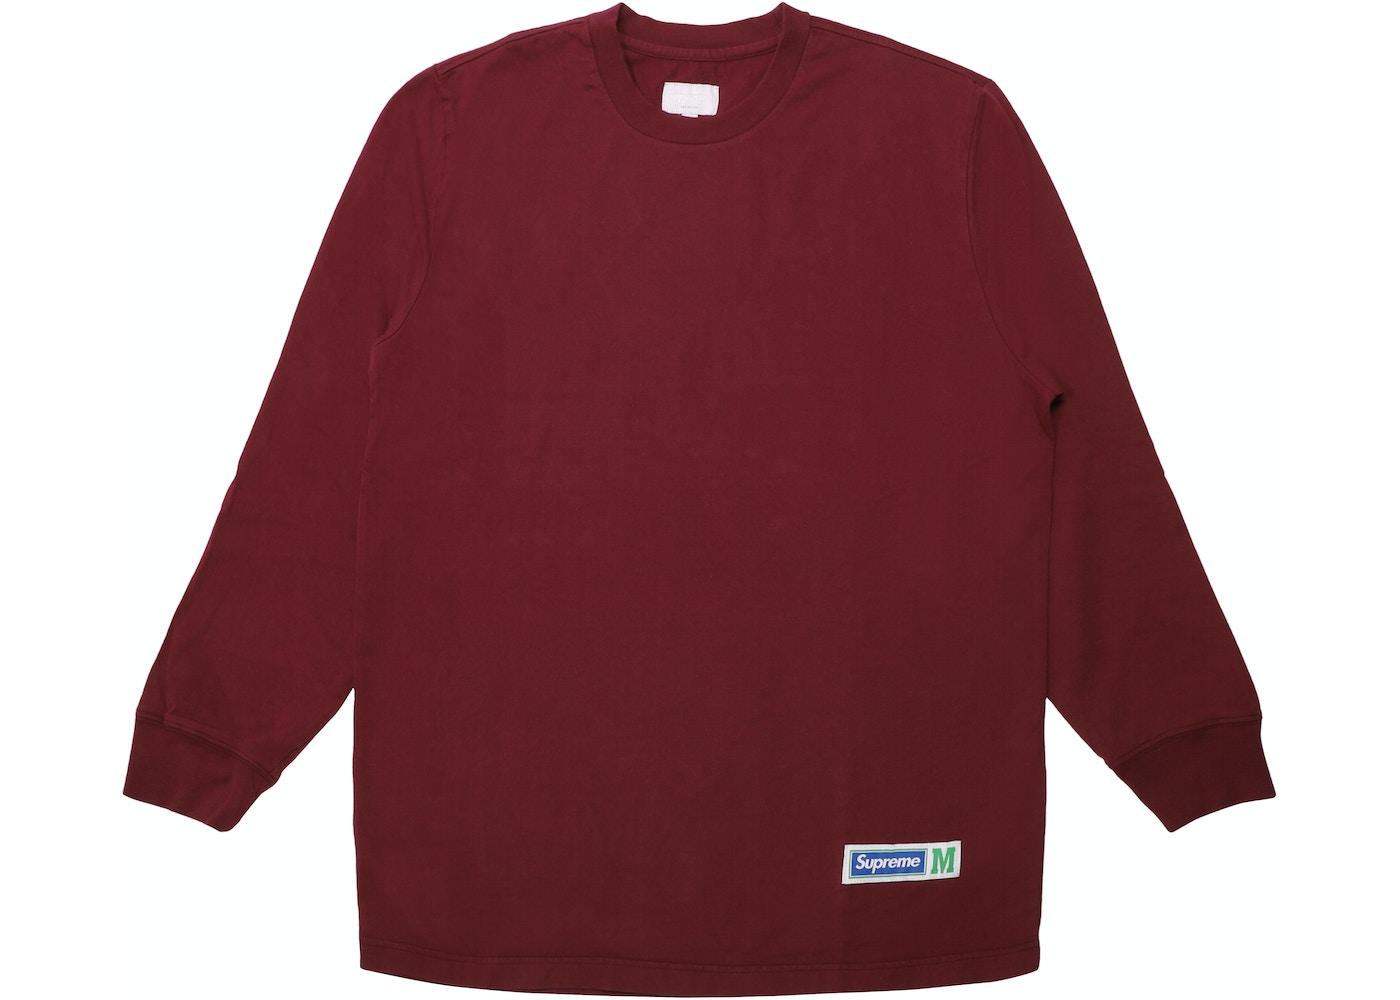 2a287c227bd8 Streetwear - Supreme Tops Sweatshirts - Volatility